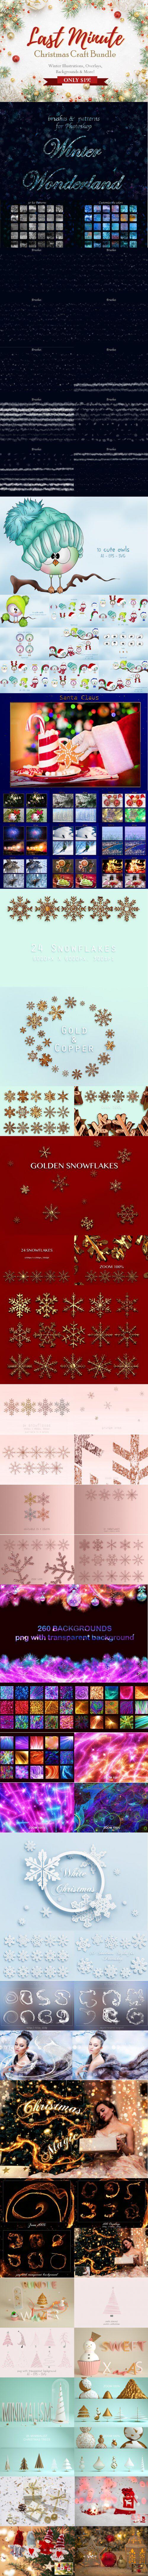 last-minute-christmas-craft-optimized-collage.jpg